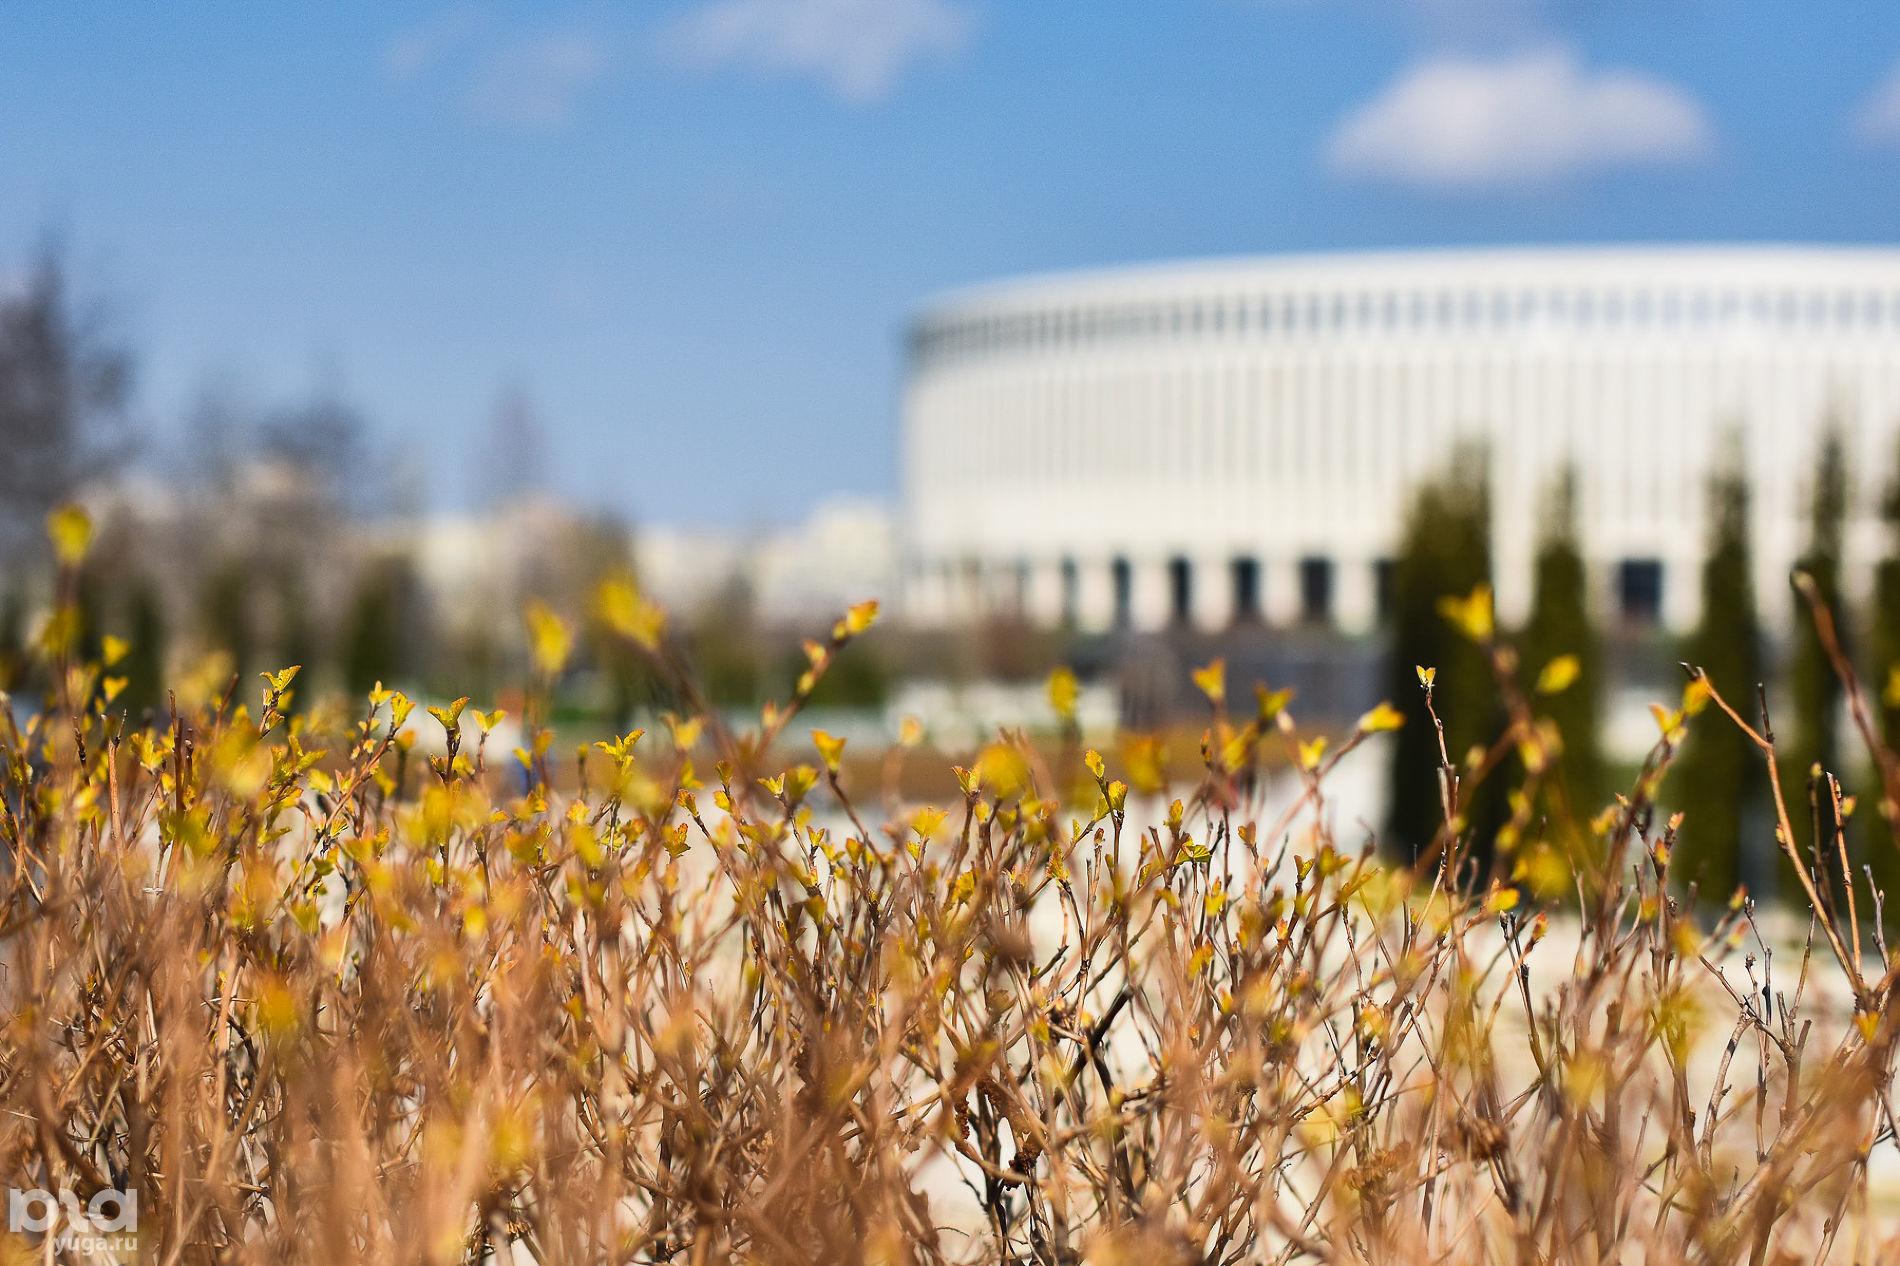 Стадион «Краснодар» © Фото Елены Синеок, Юга.ру